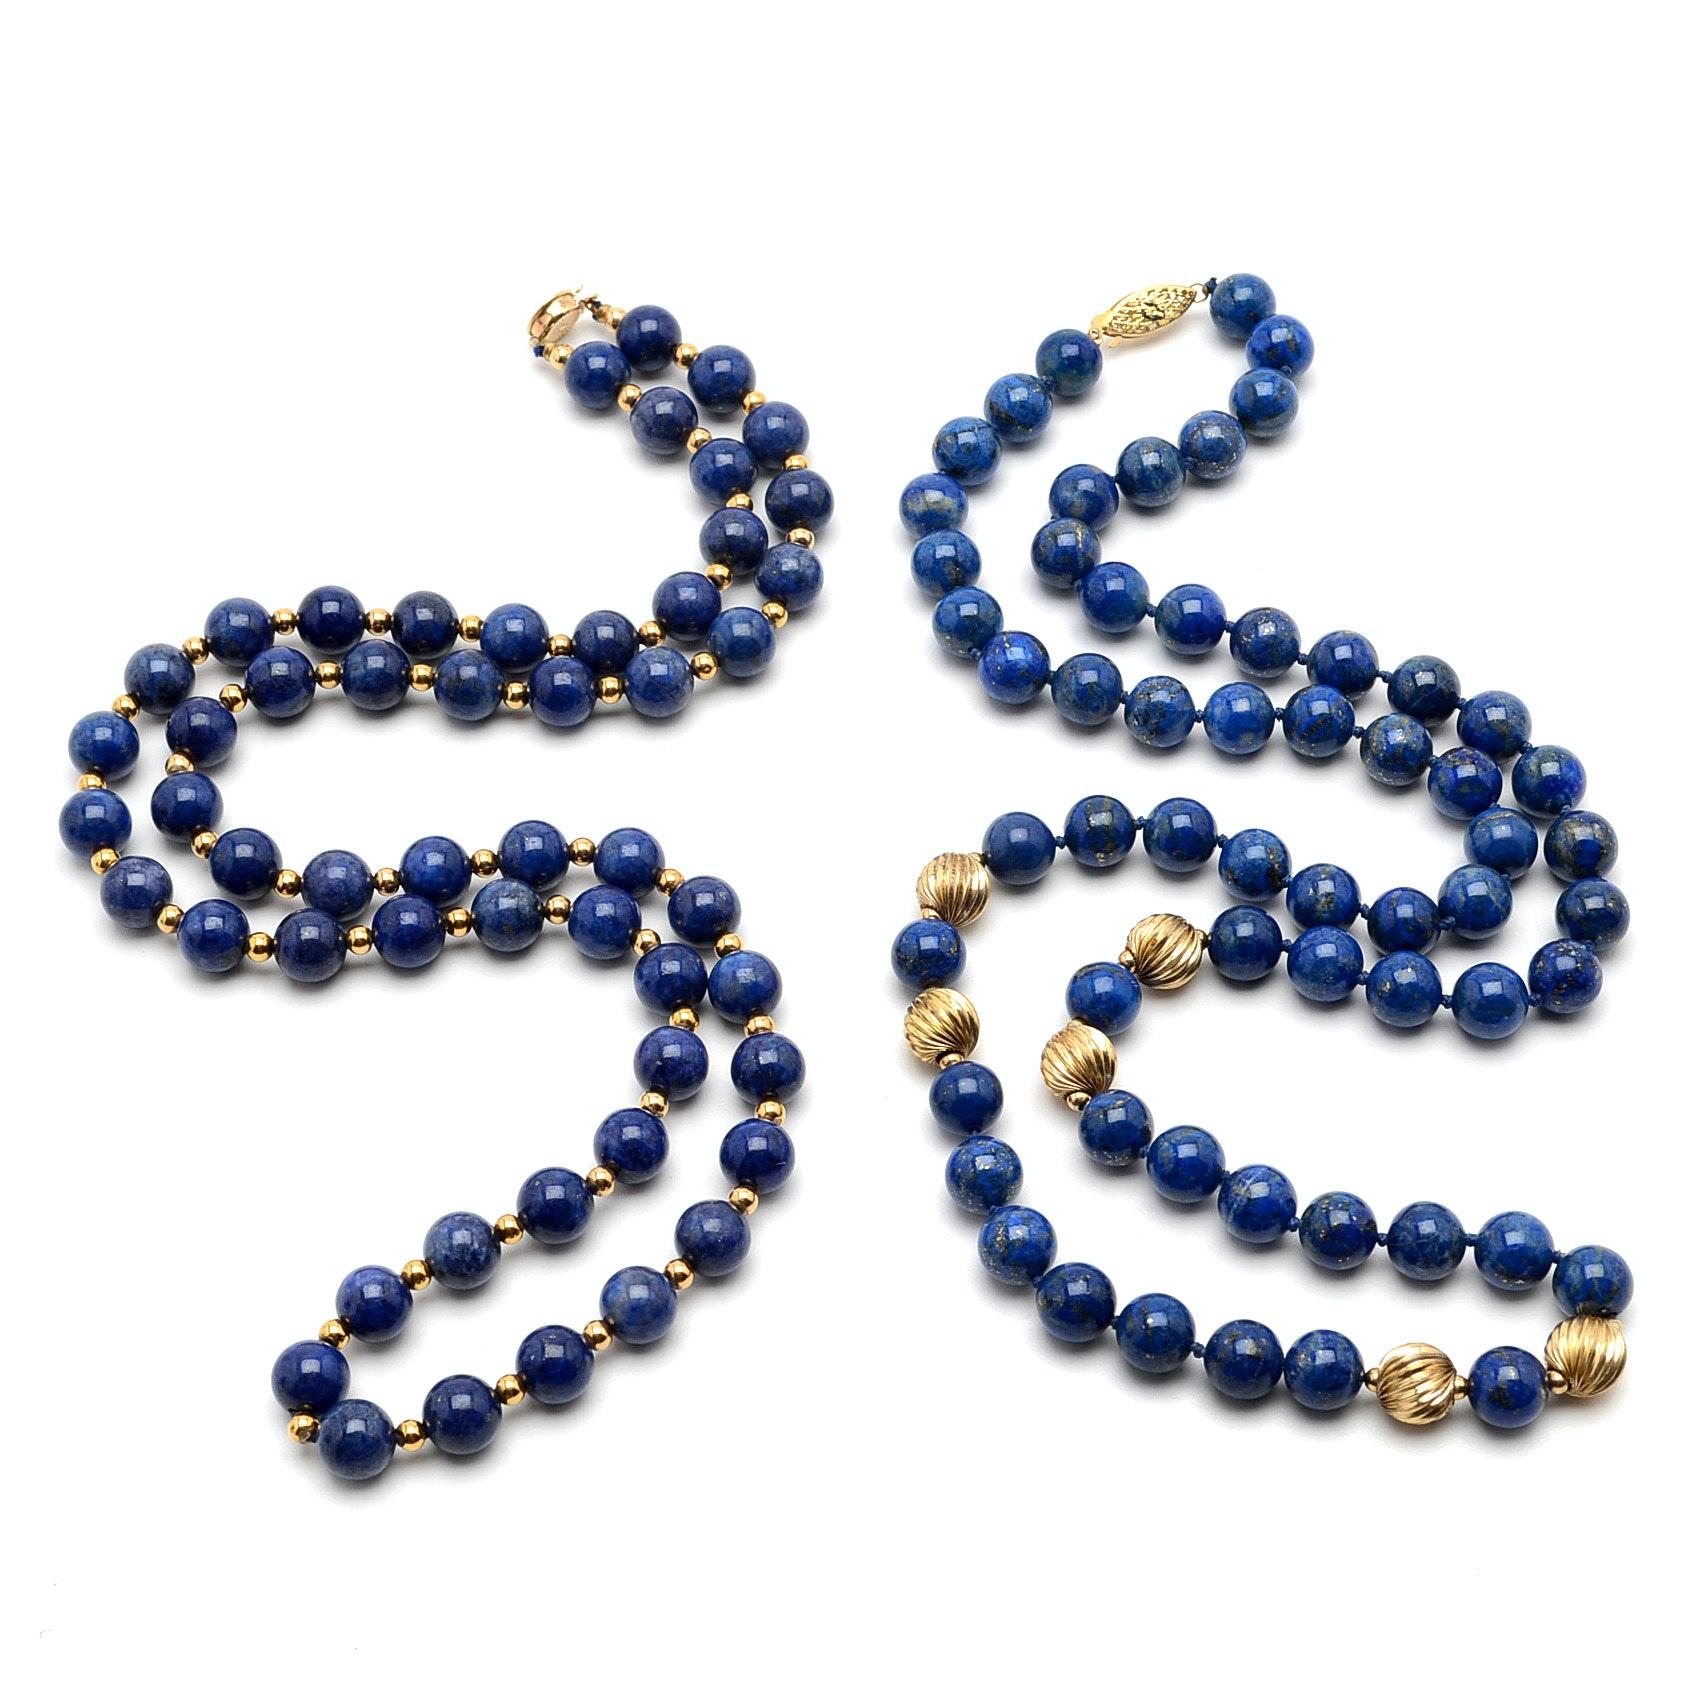 Two Lapis Lazuli Beaded Necklaces